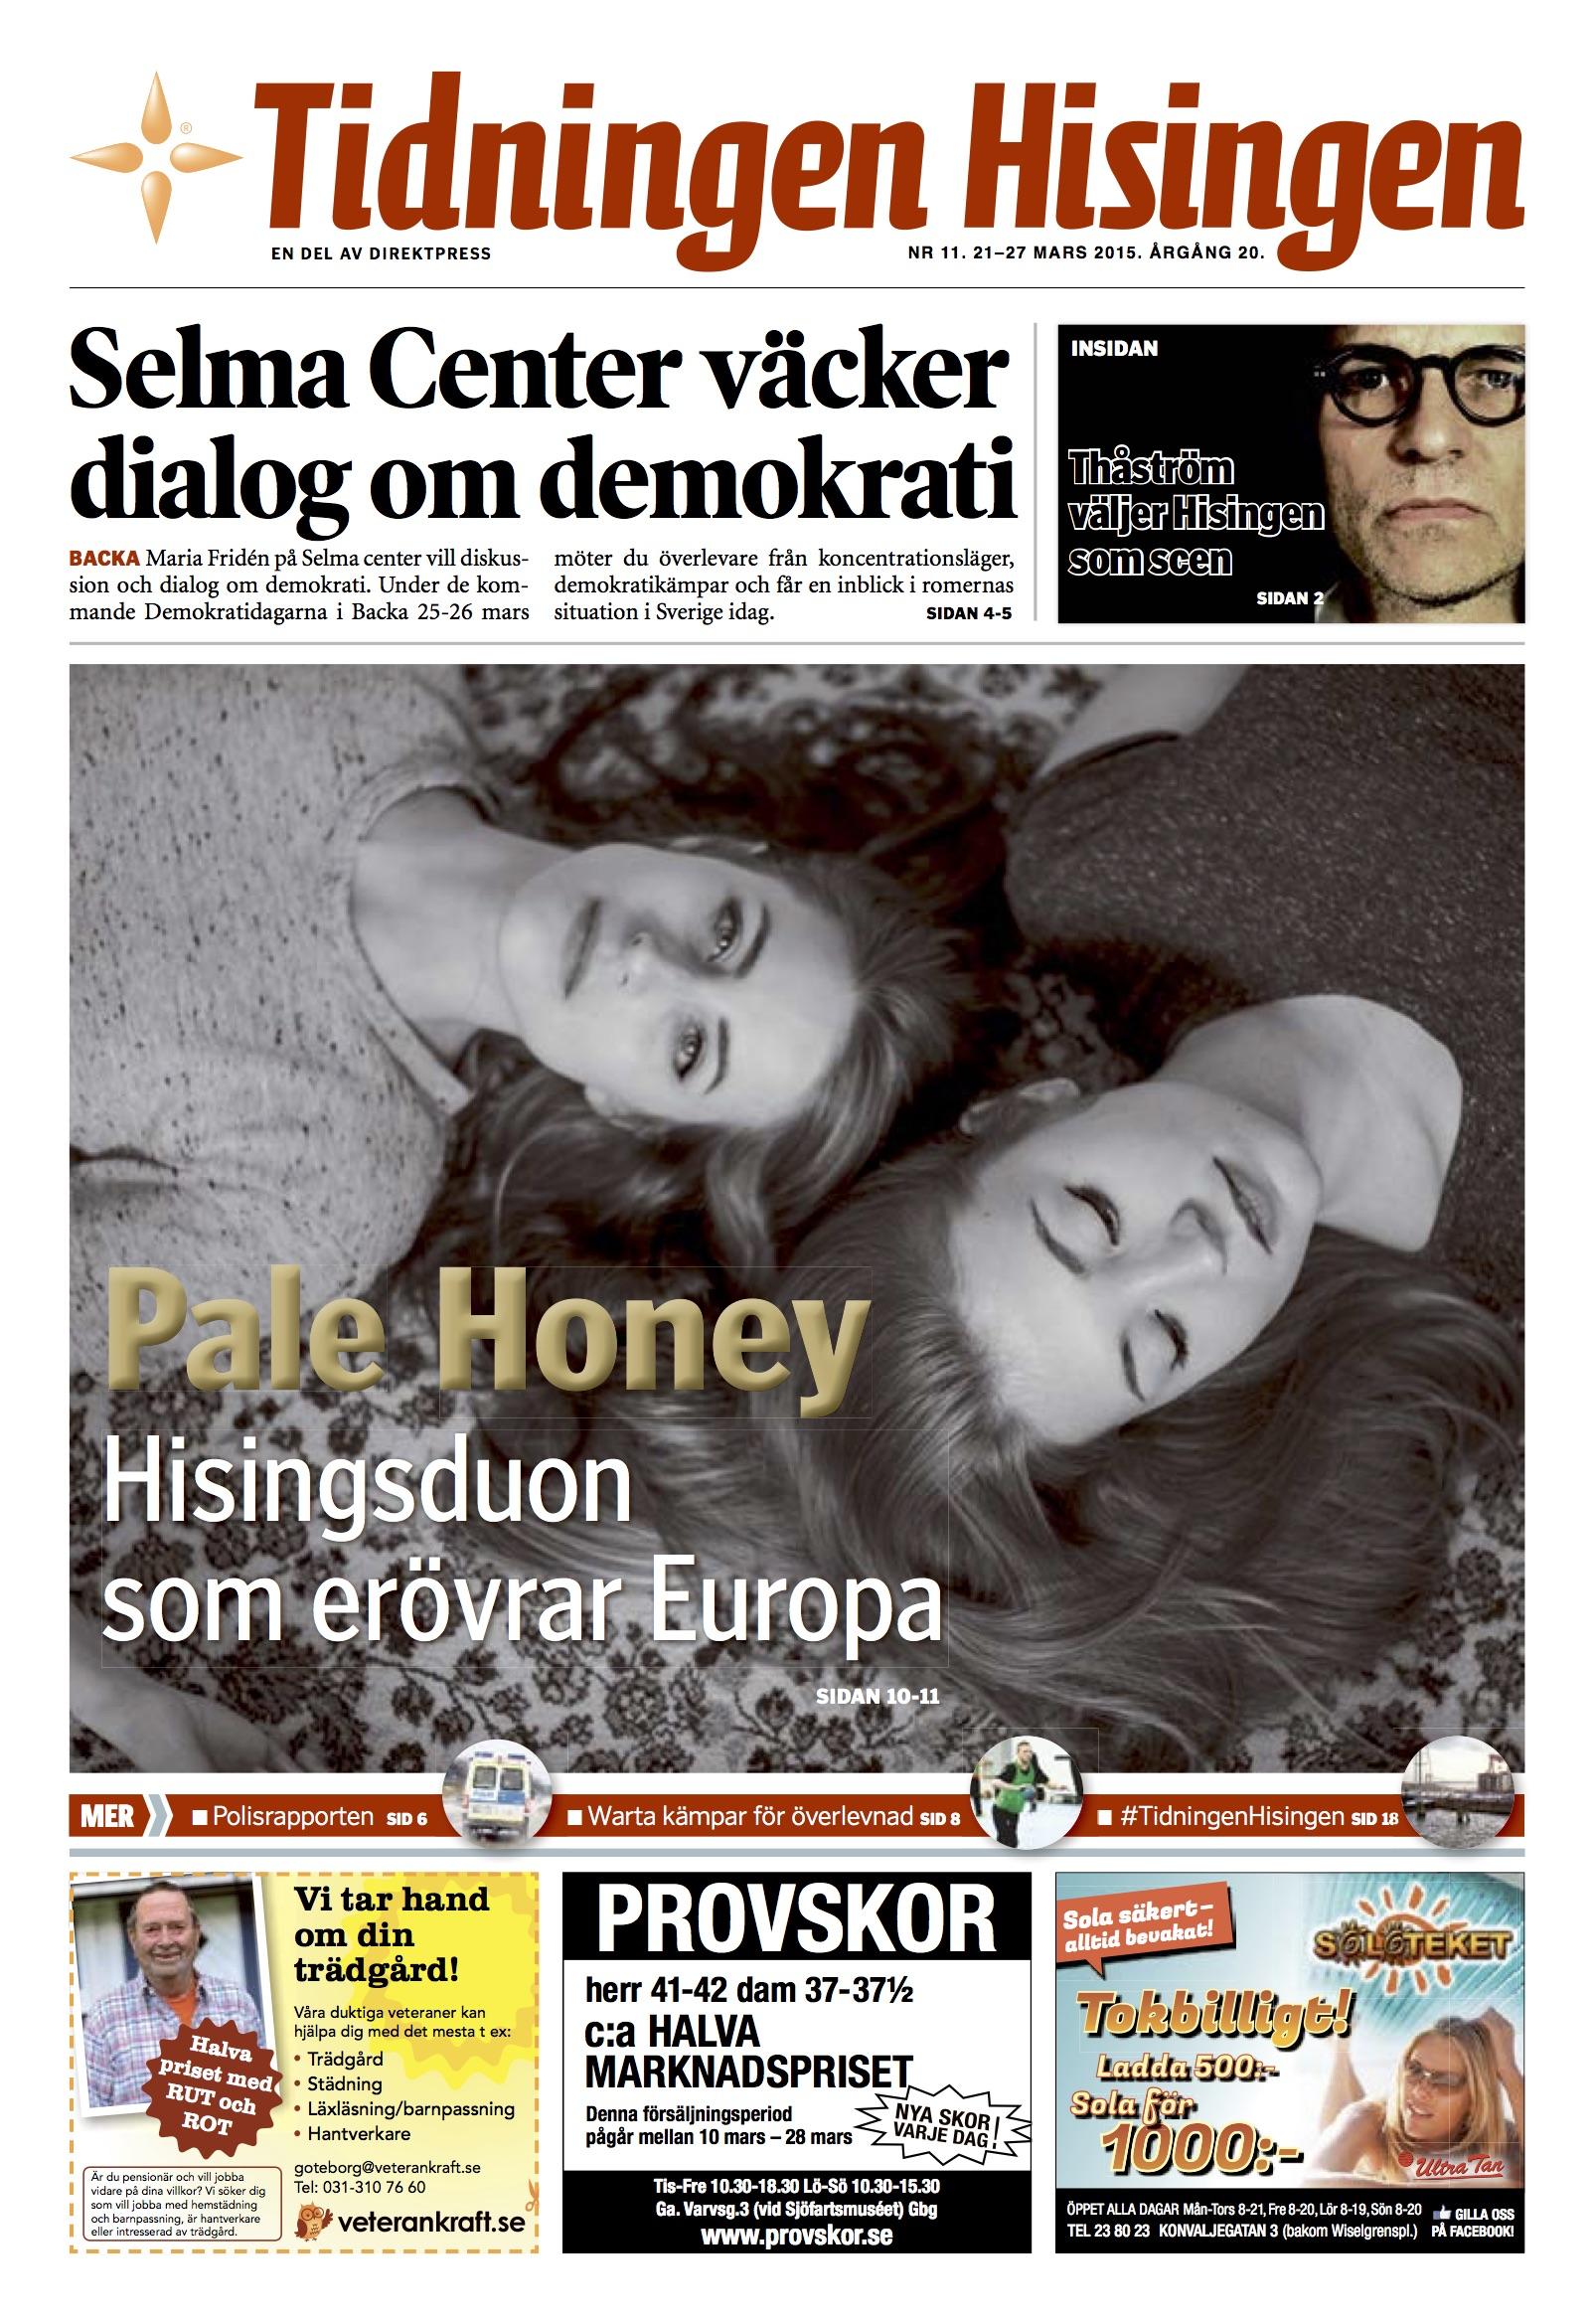 Direktpress GBG omslag - Pale Honey.jpg